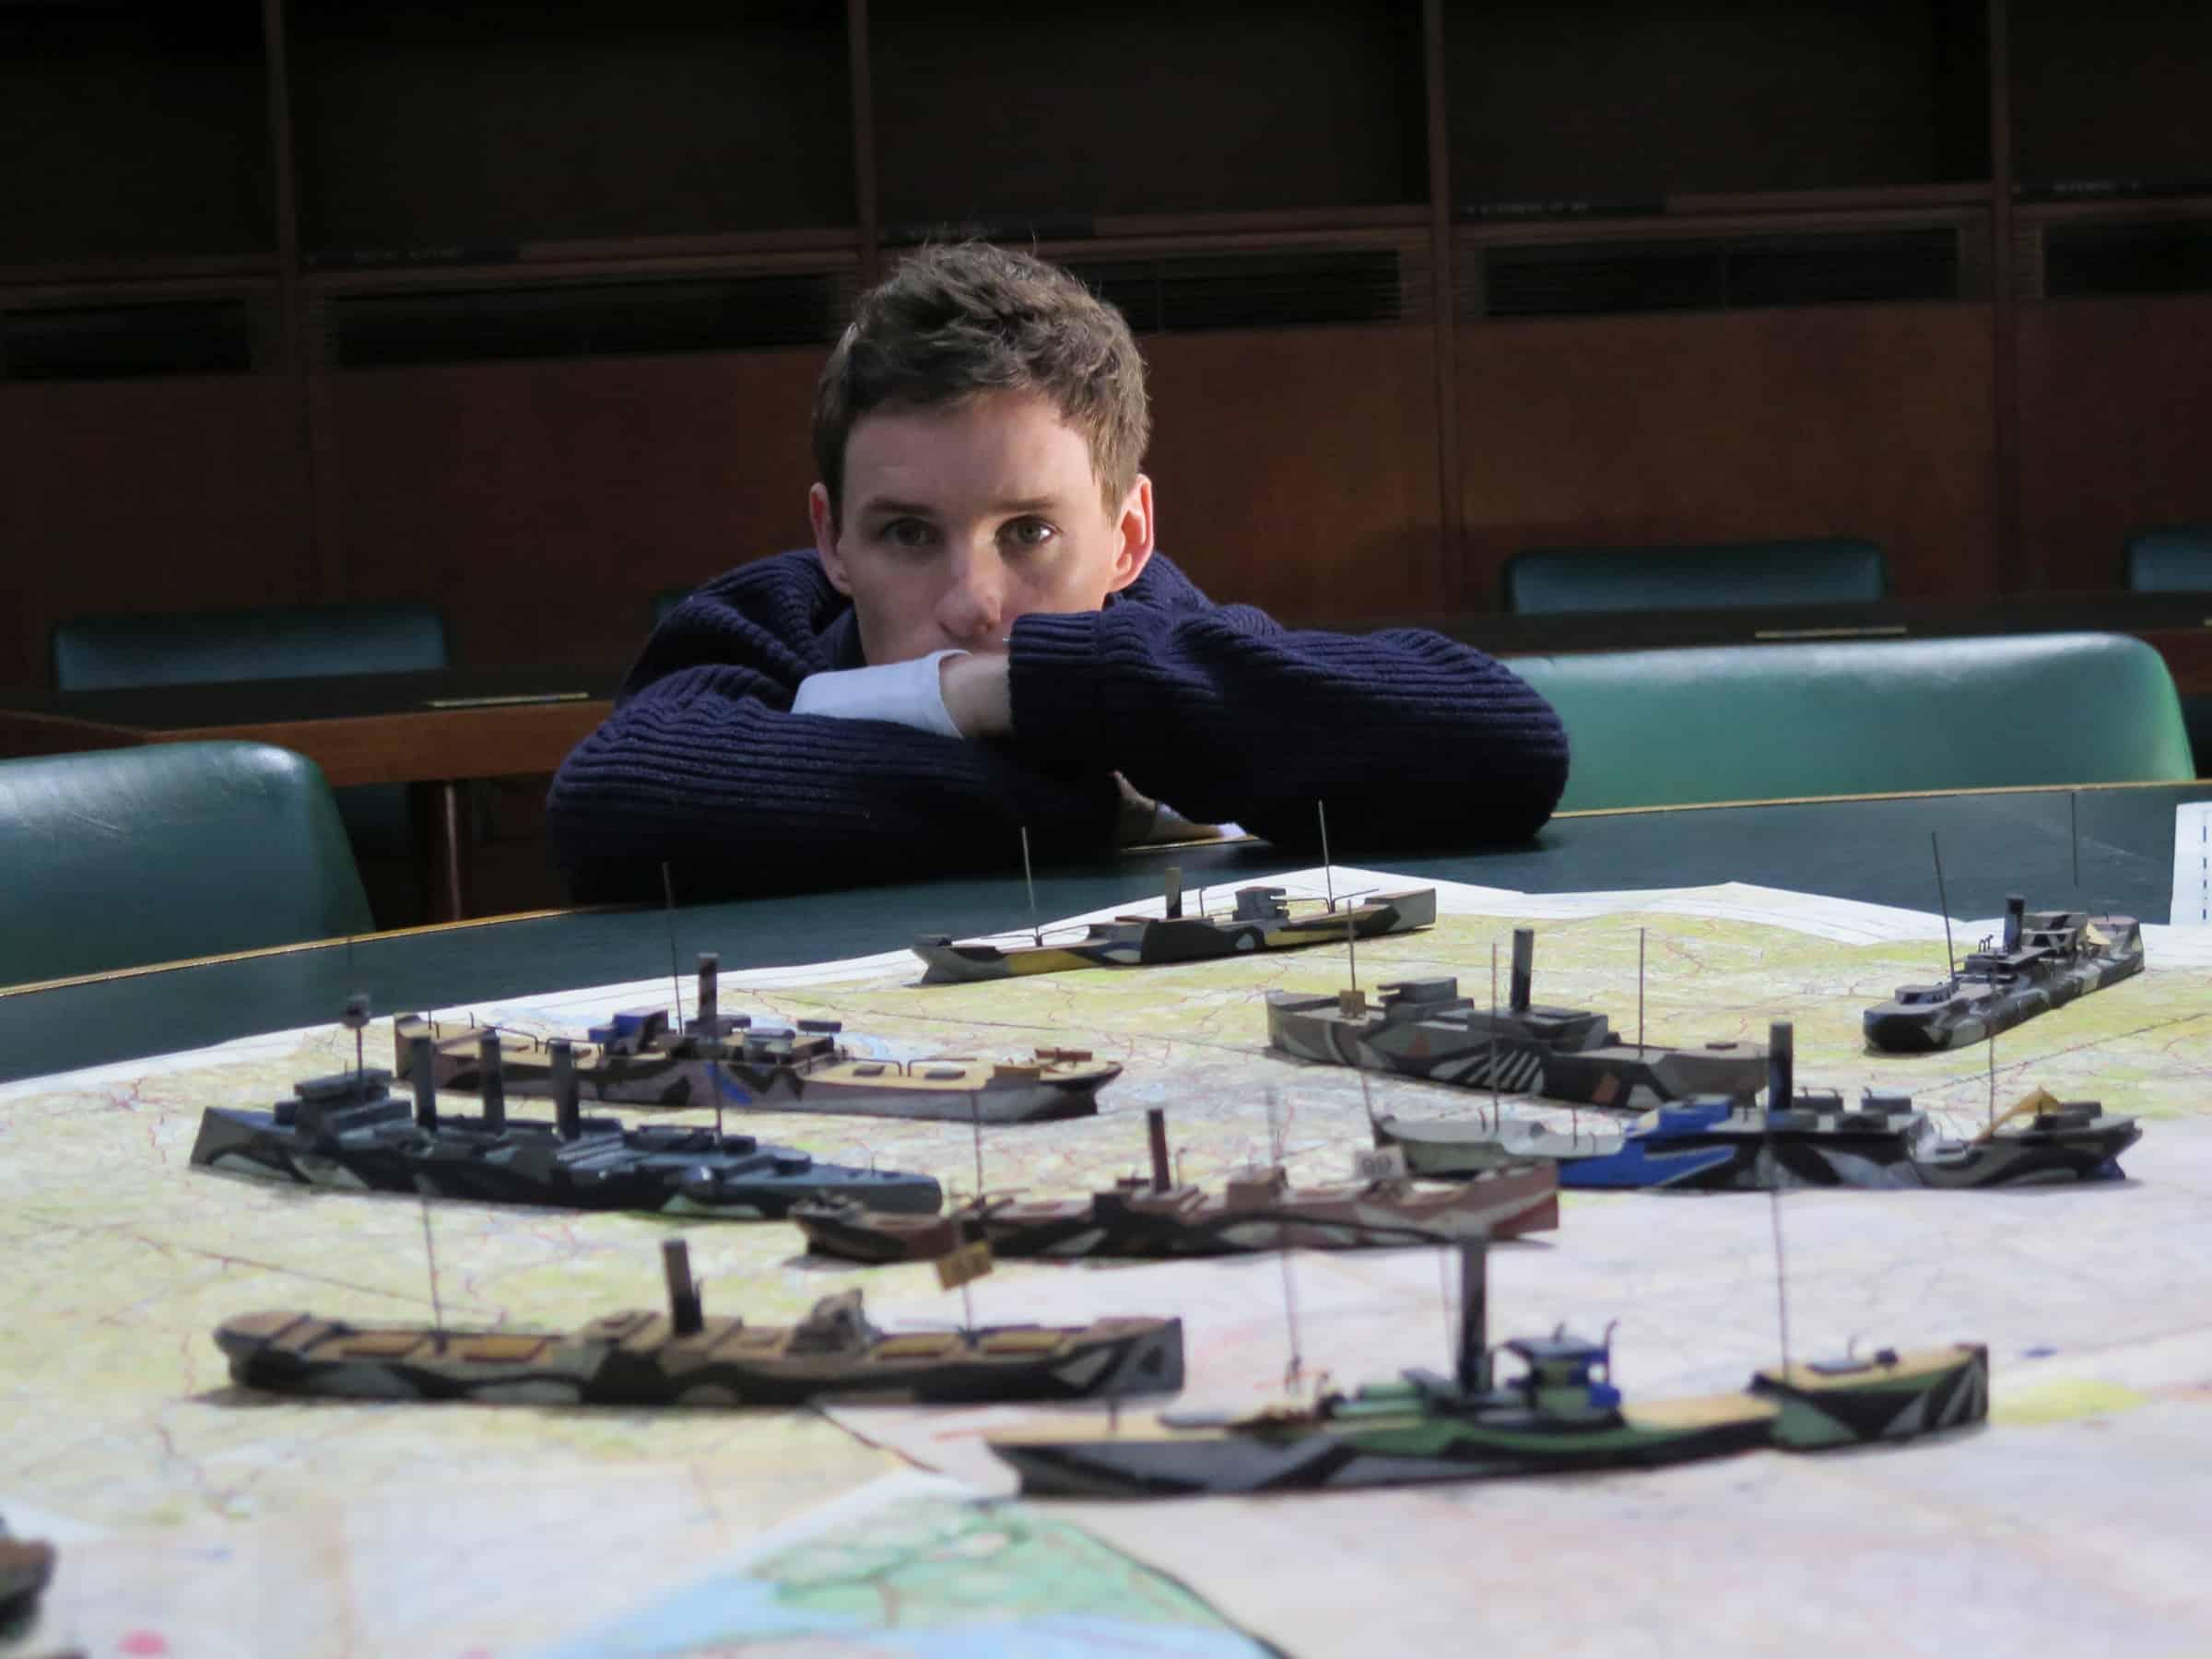 Eddie Redmayne with Dazzle ship models at the IWM. Photograph ® www.foxtrotfilms.com